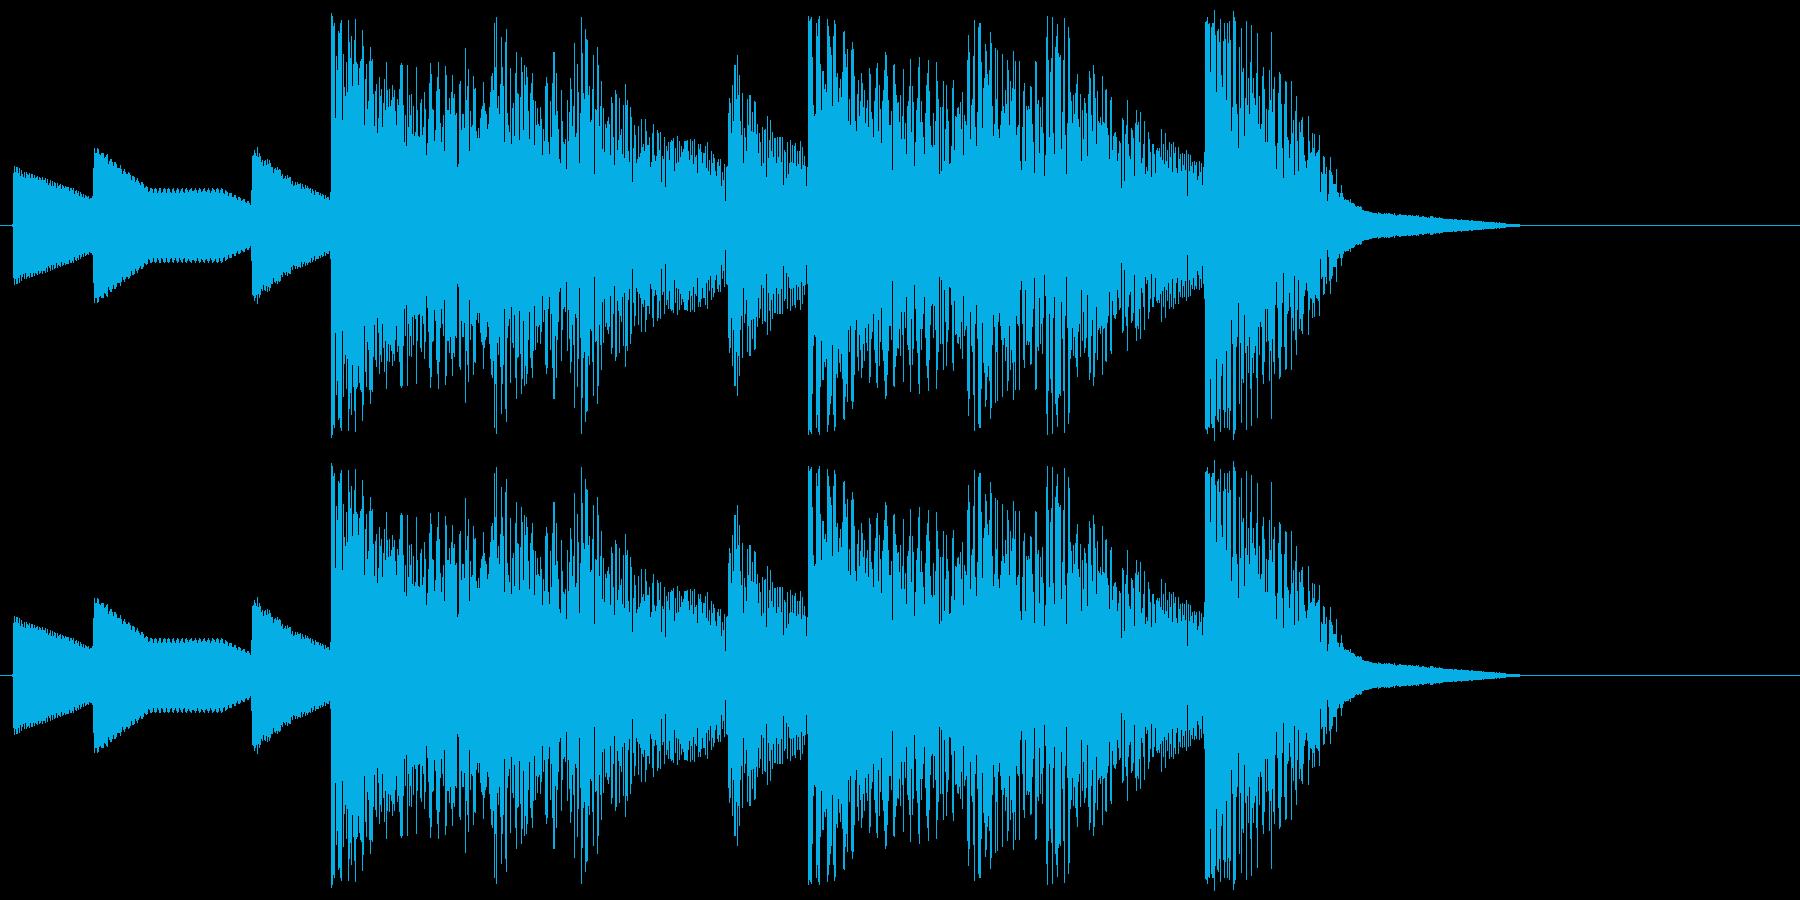 8bitジングル#5スタート&クリアの再生済みの波形